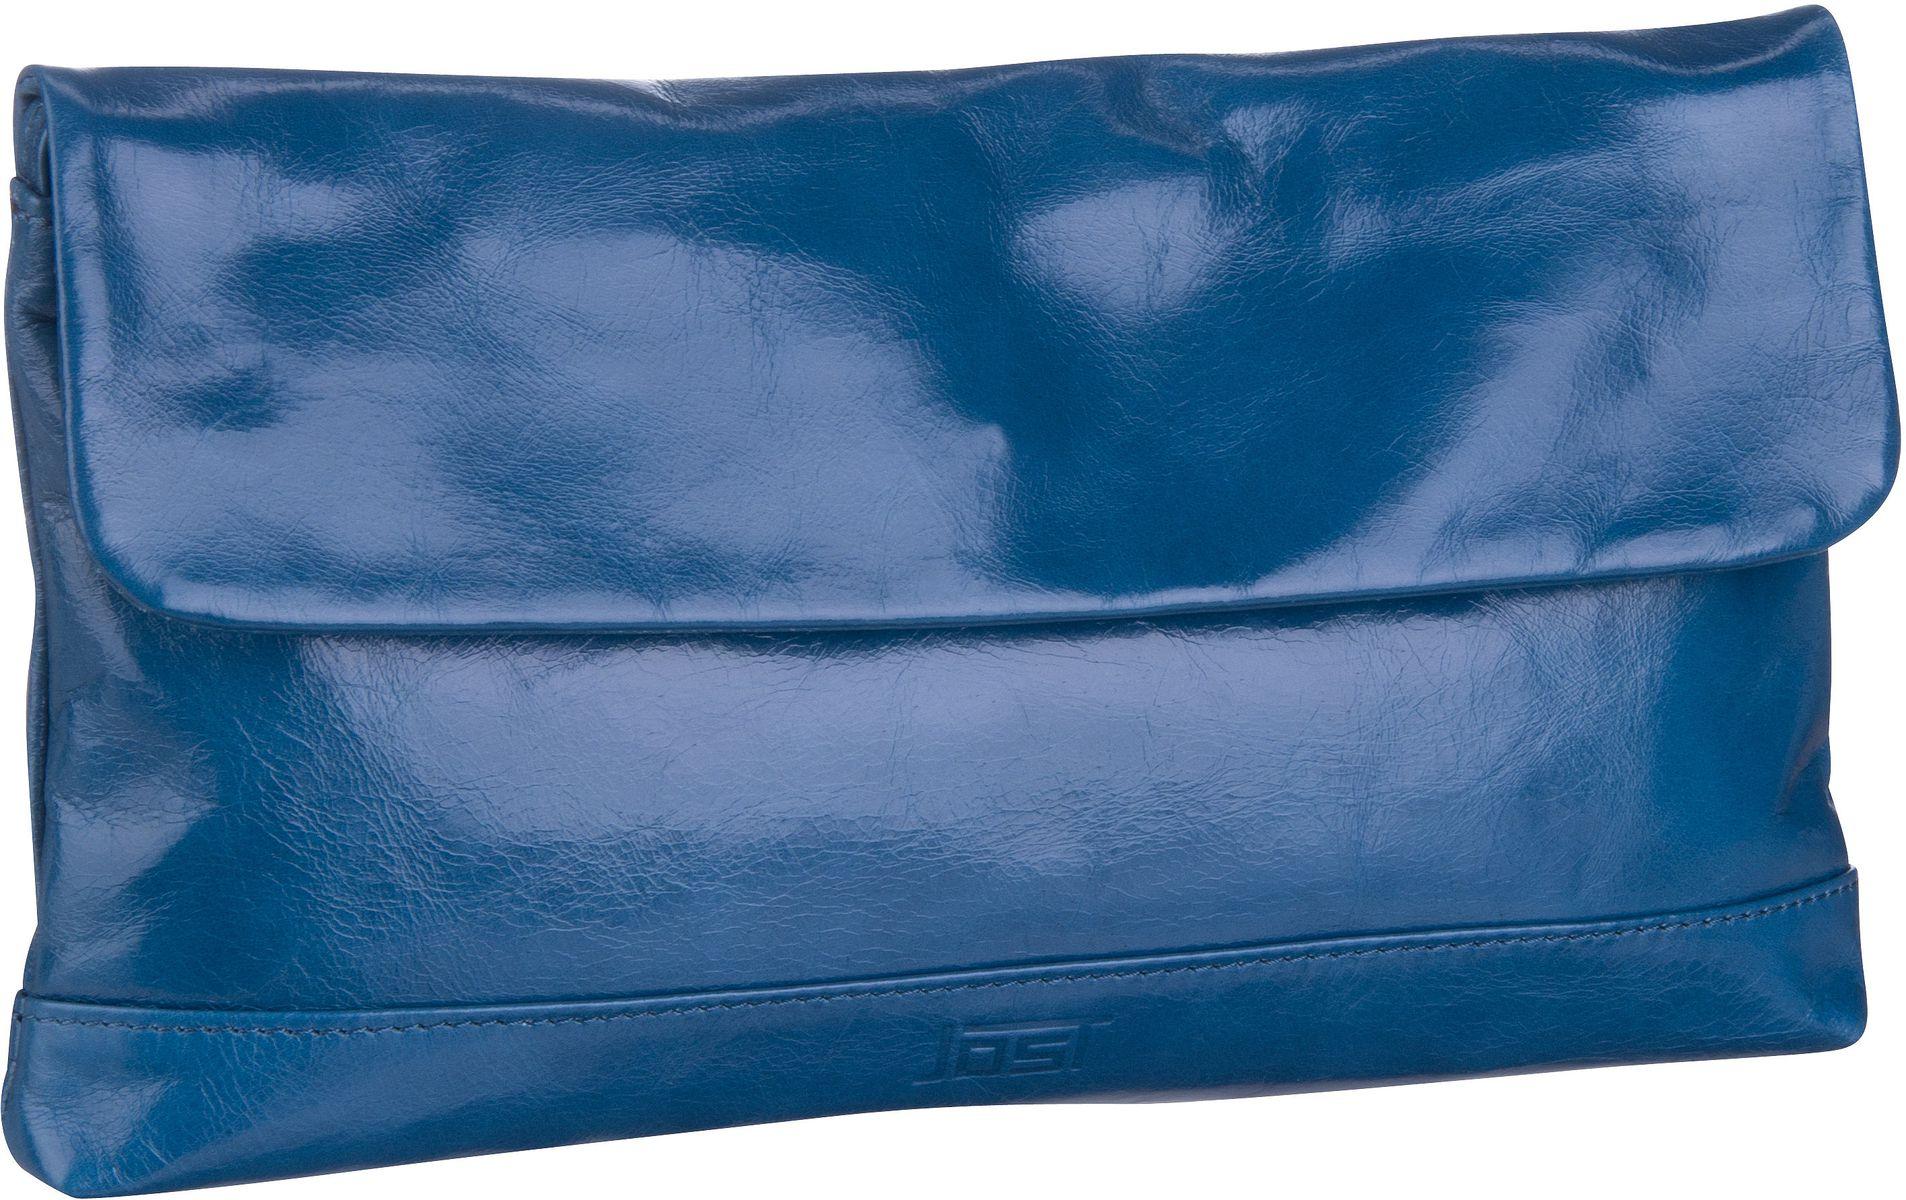 Handtasche Boda 6620 Clutch Royalblue